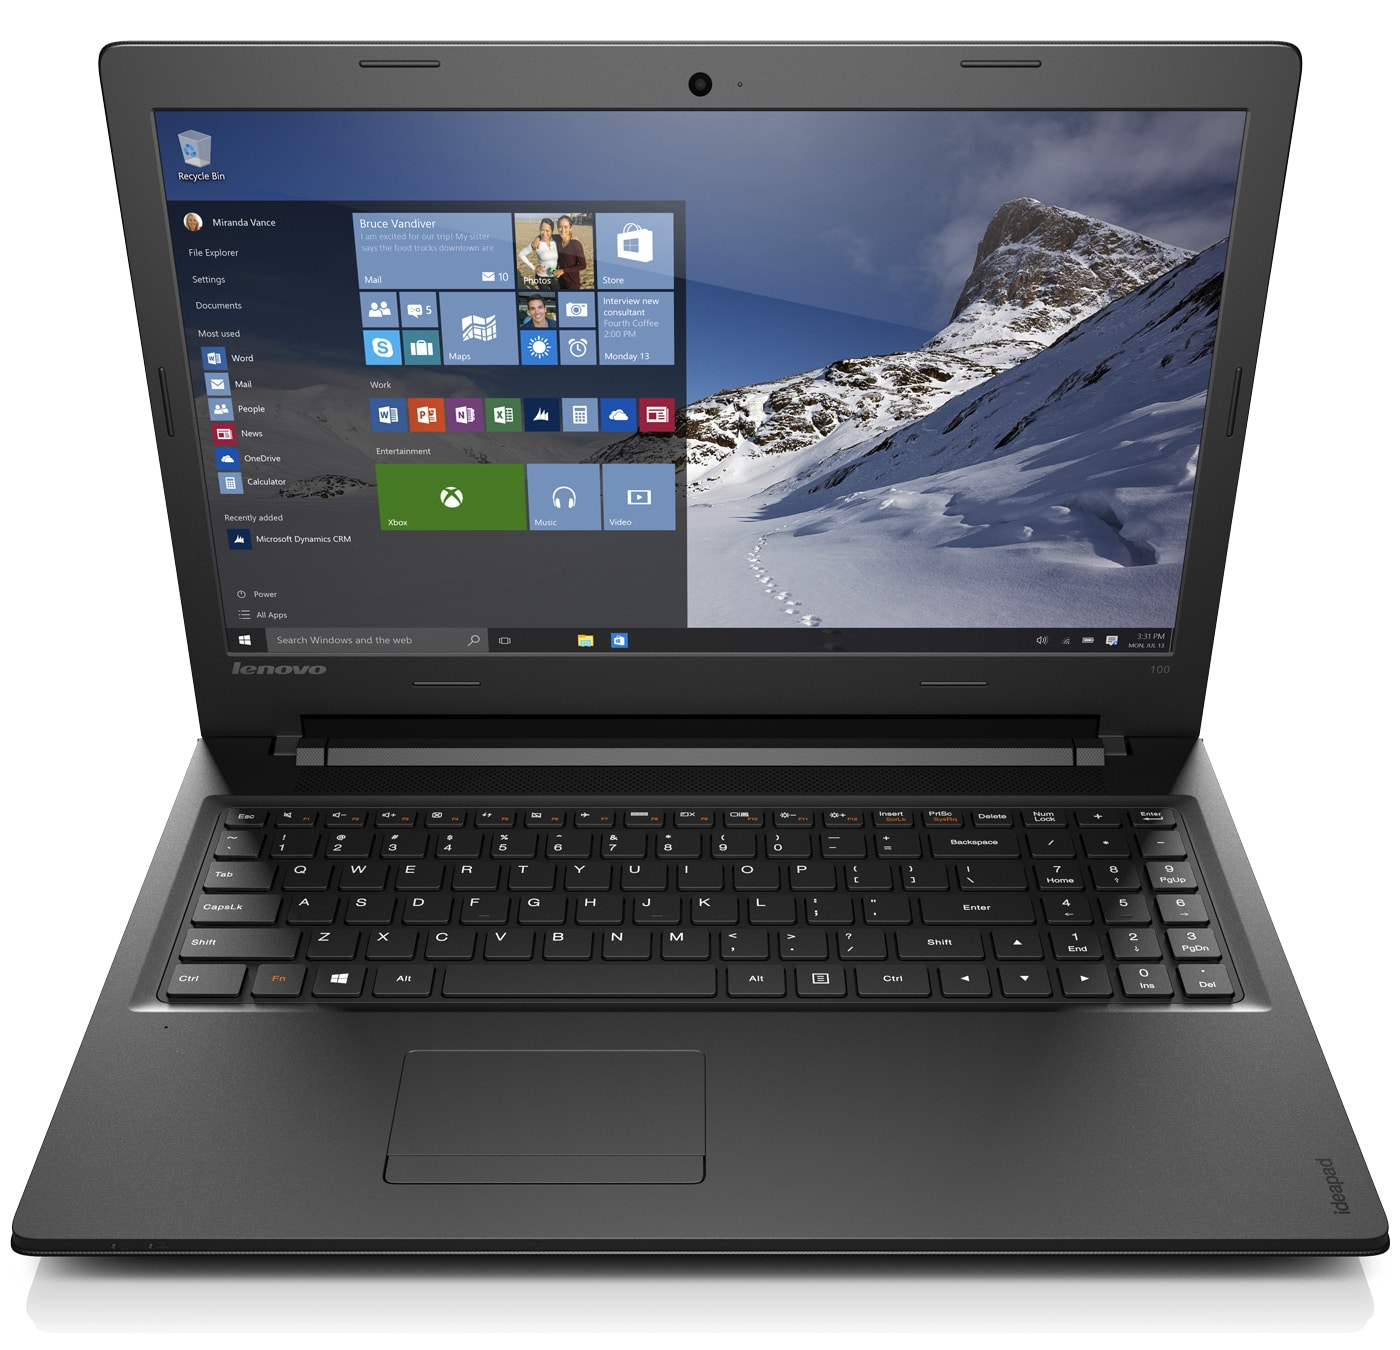 Lenovo Ideapad 110-15ISK à 499€, PC portable 15 pouces Full HD i5 Radeon